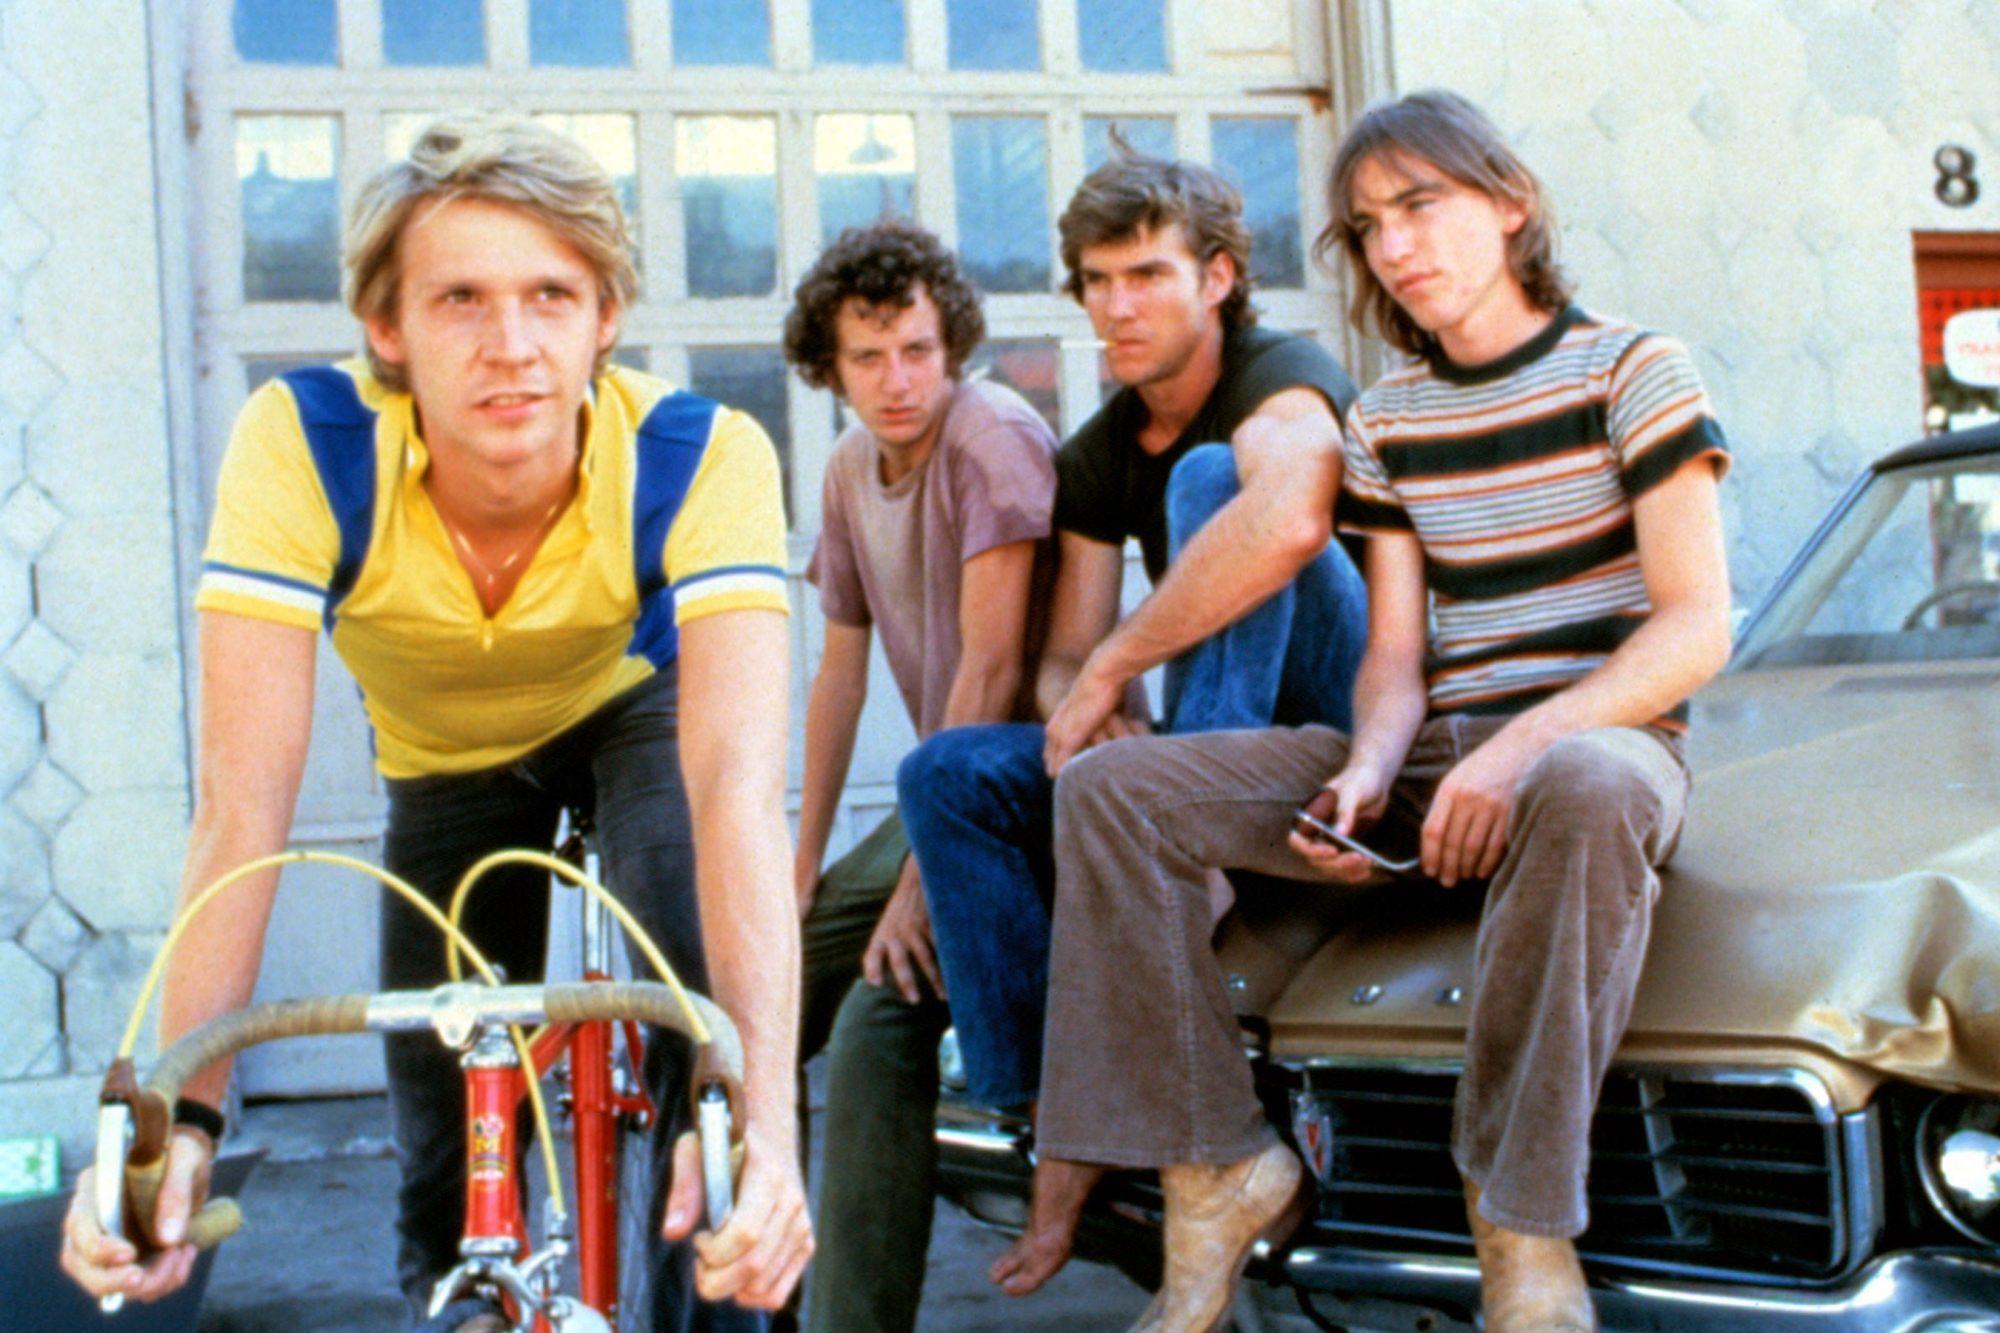 BREAKING AWAY, Dennis Christopher, Daniel Stern, Dennis Quaid, Jackie Earle Haley, 1979, TM & Copyri